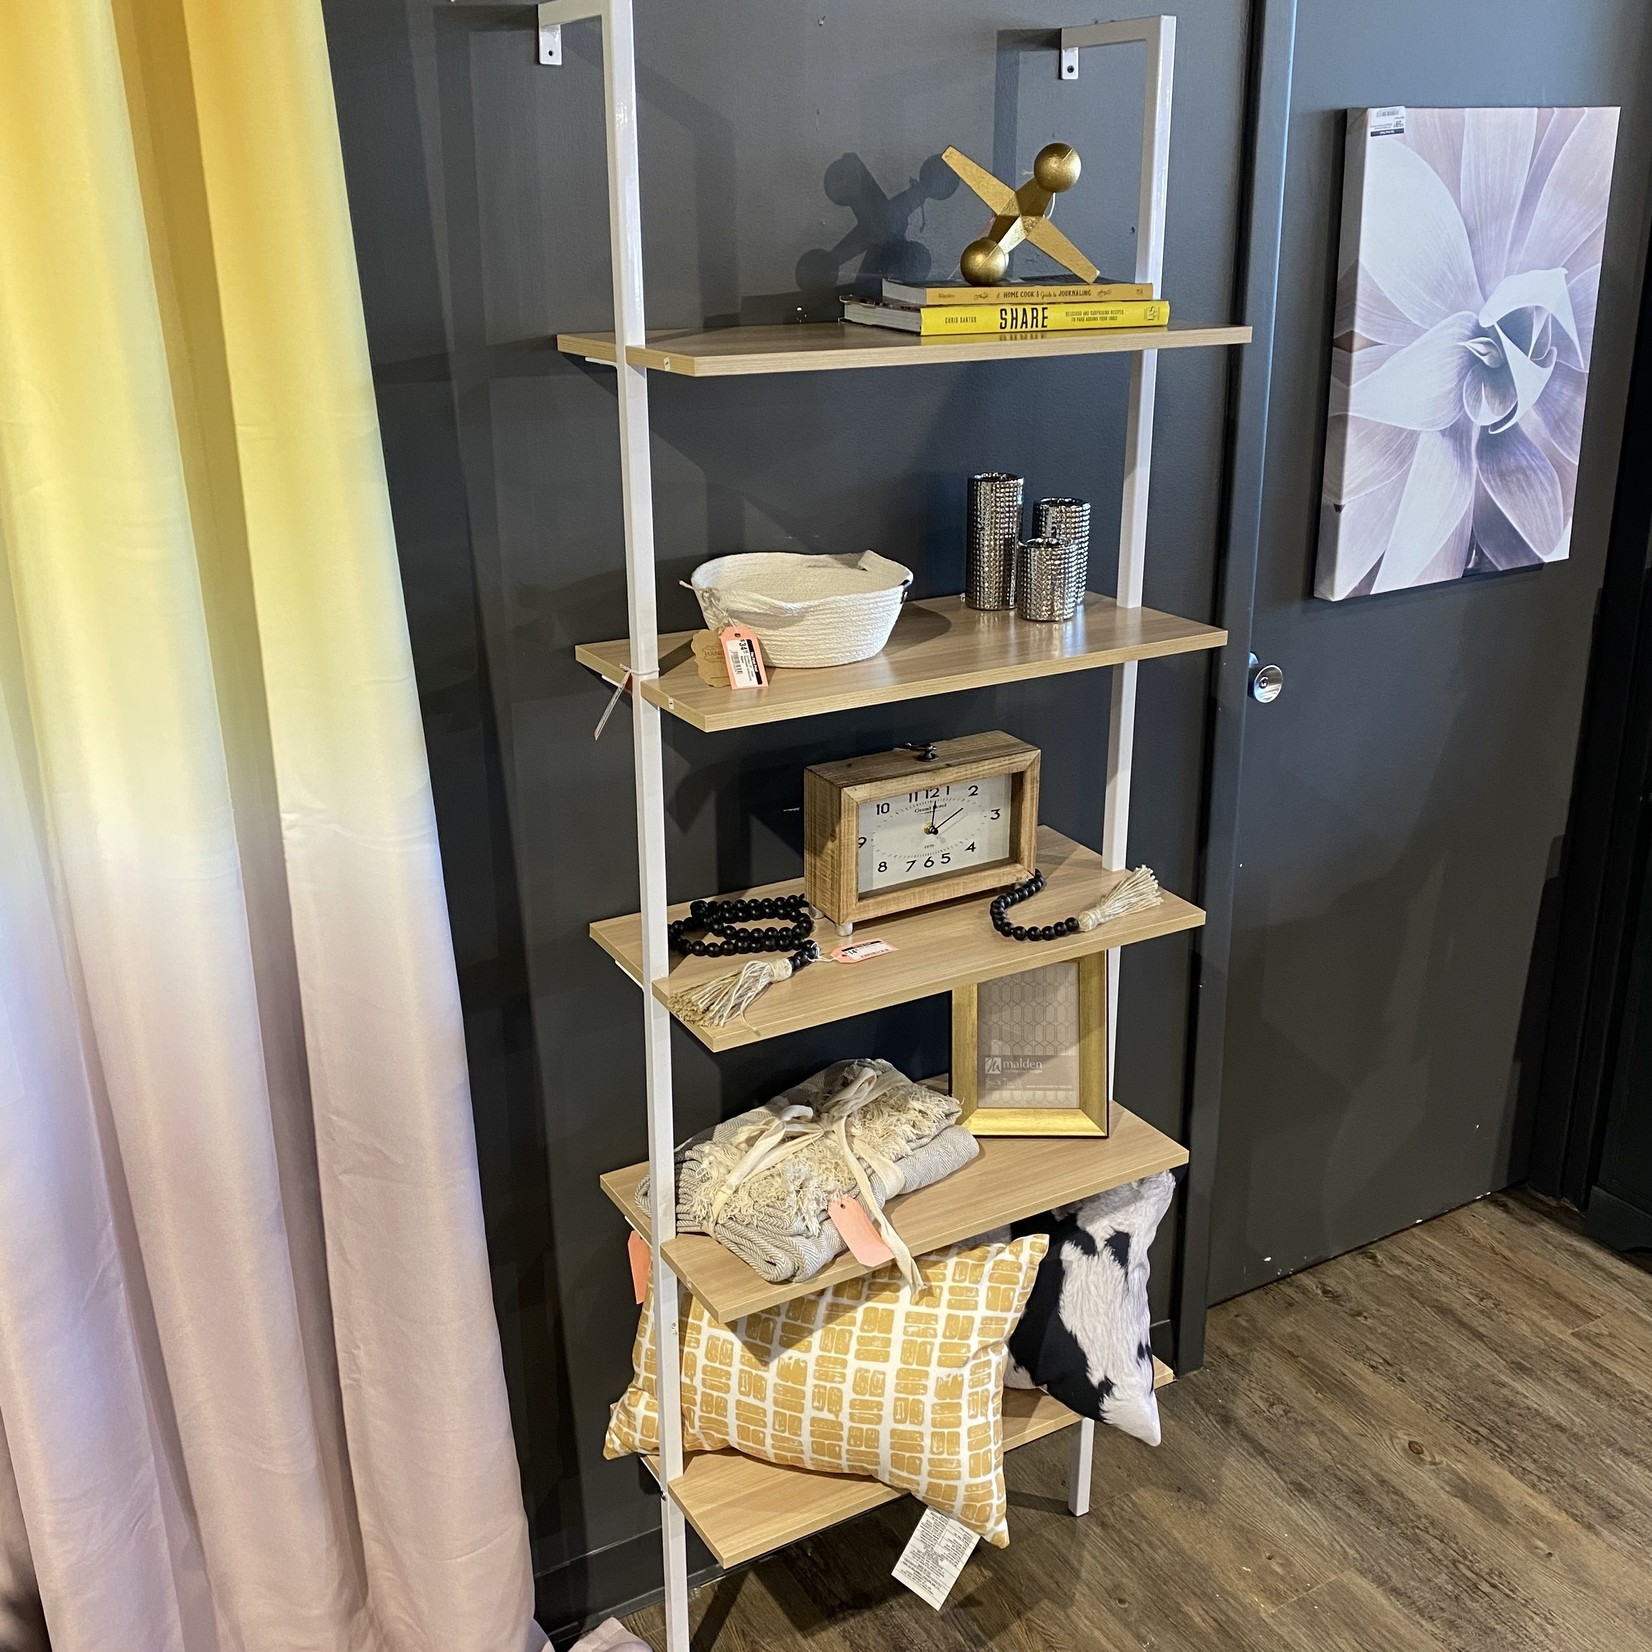 "*Zachary 72.5"" H x 24"" W Metal Ladder Bookcase - Unassembled"